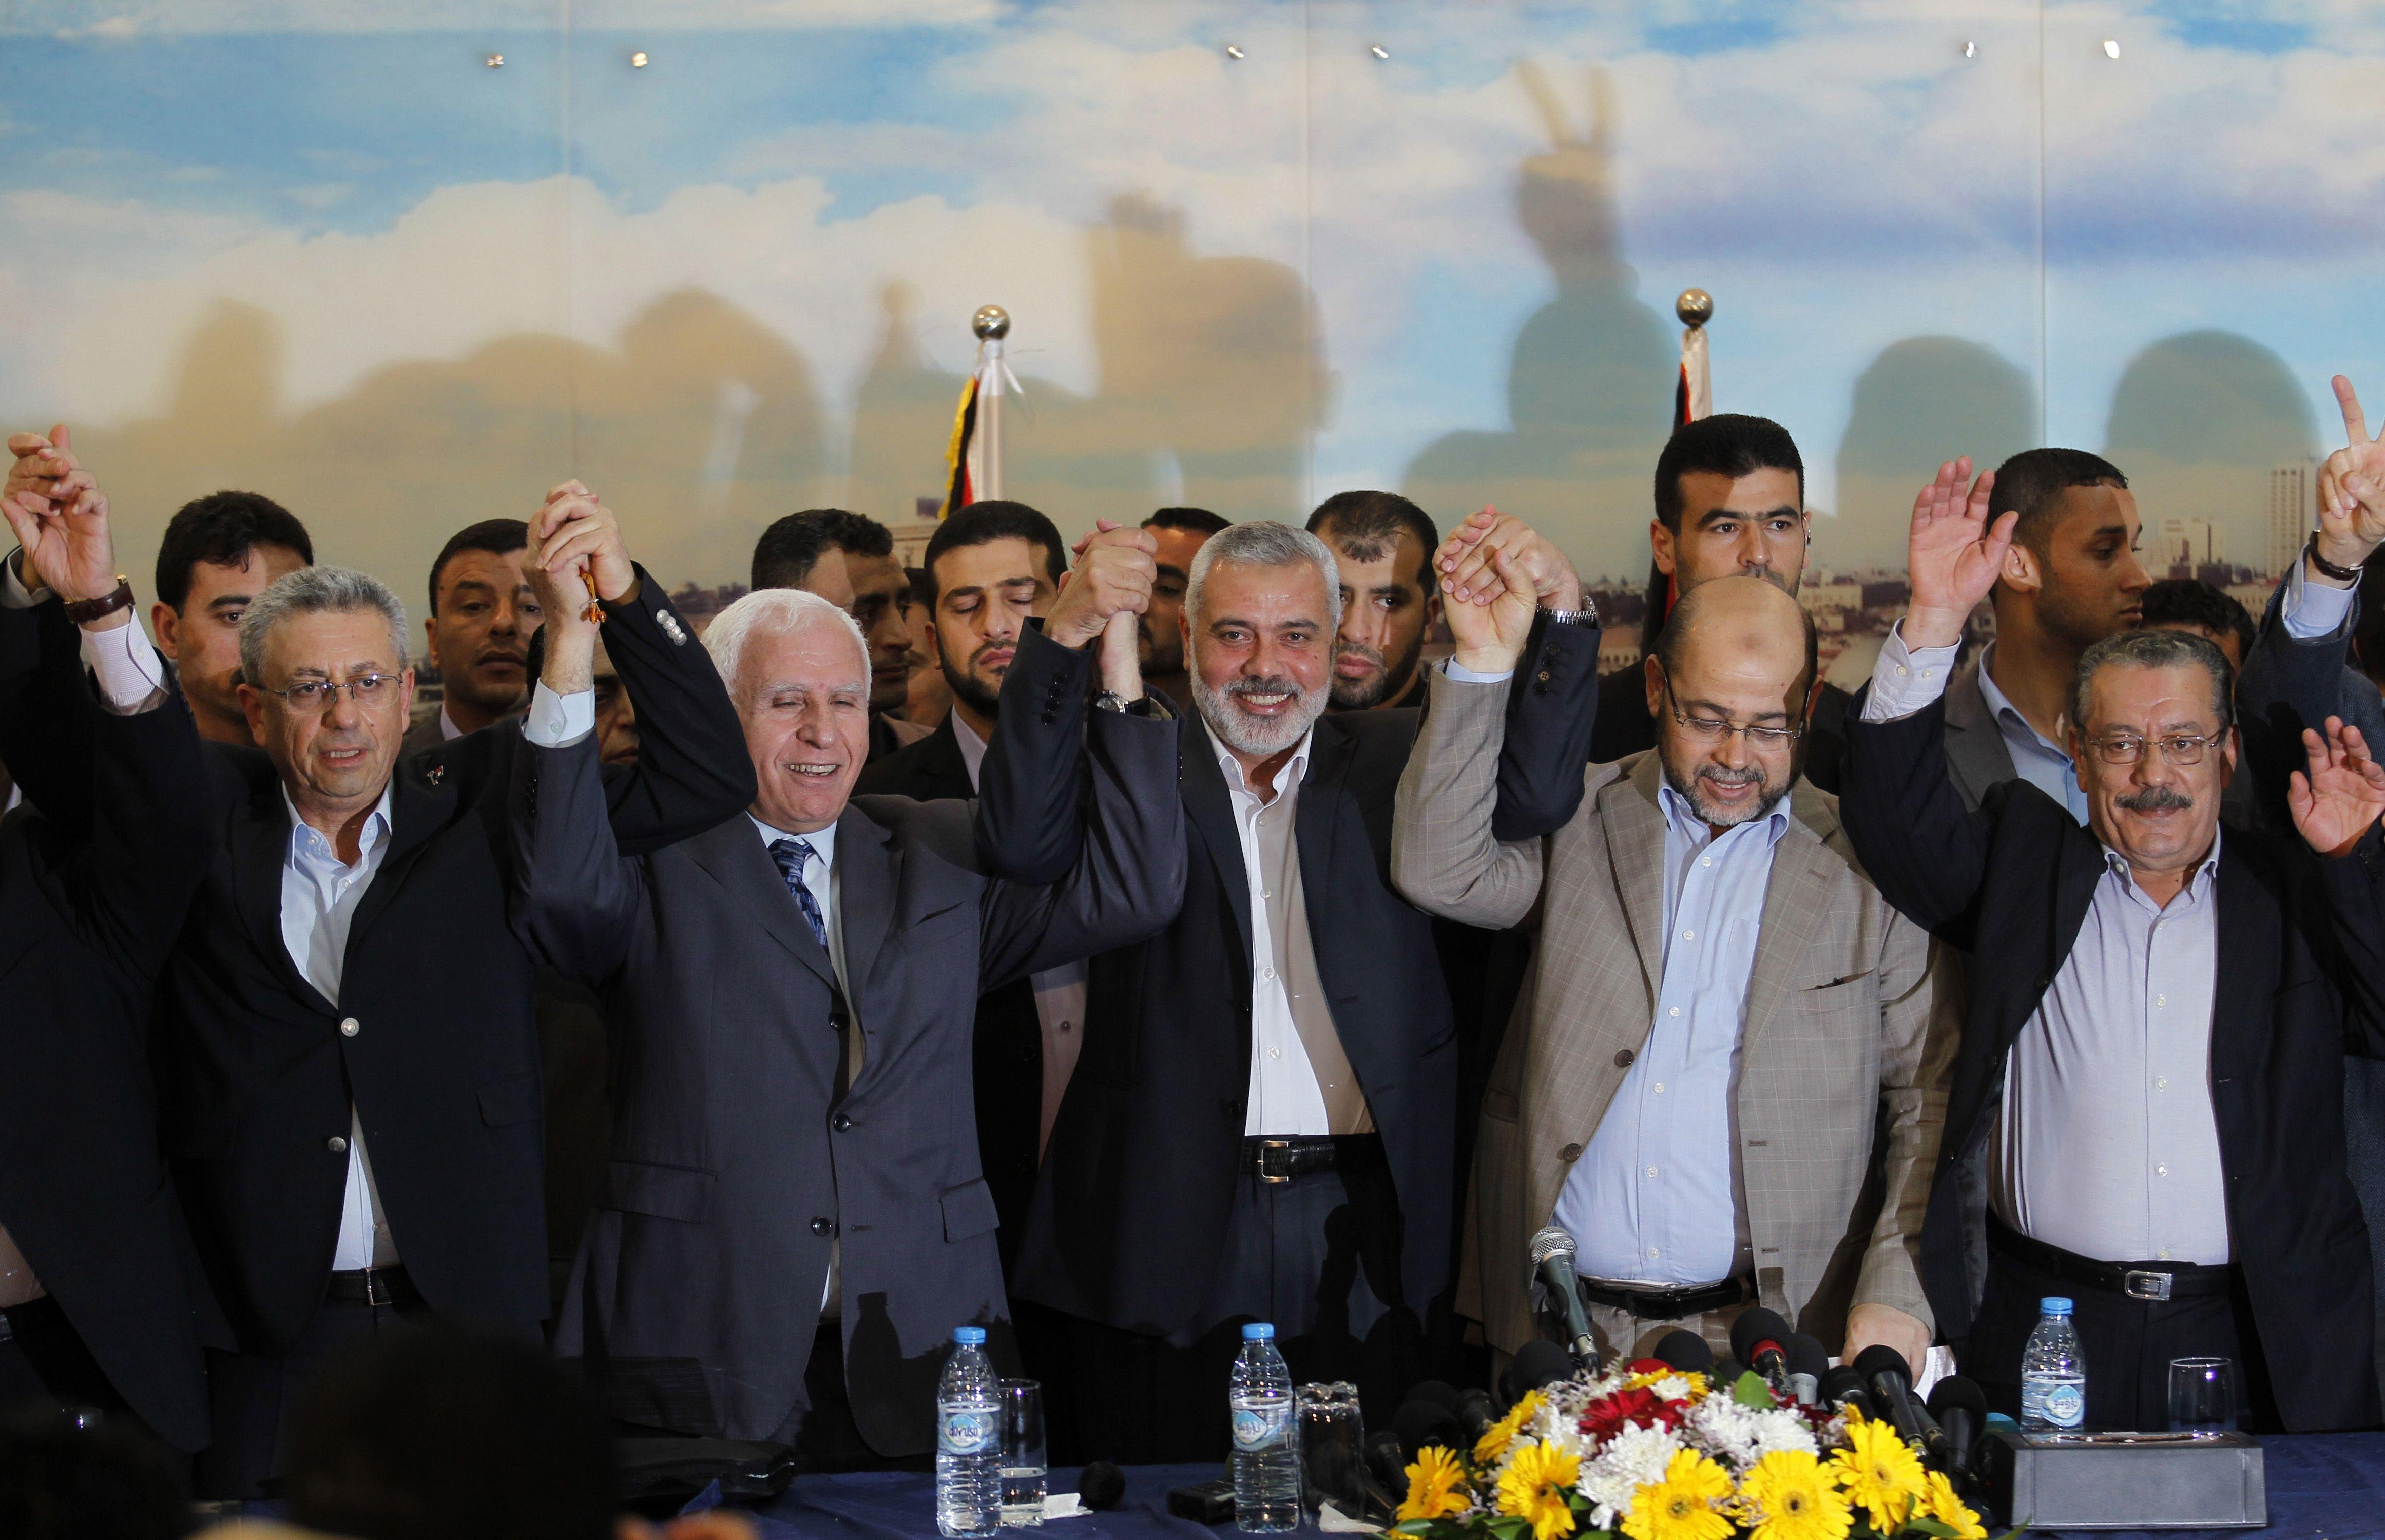 From left: Palestinian legislator Mustafa Barghouti, Palestinian Fatah delegation chief Azzam al-Ahmed, Hamas prime minister in the Gaza Strip Ismail Haniya, Hamas deputy leader Musa Abu Marzuk, and secretary-general of the Palestinian Arab Front (PAF) Jameel Shehadeh in Gaza on April 23, 2014.